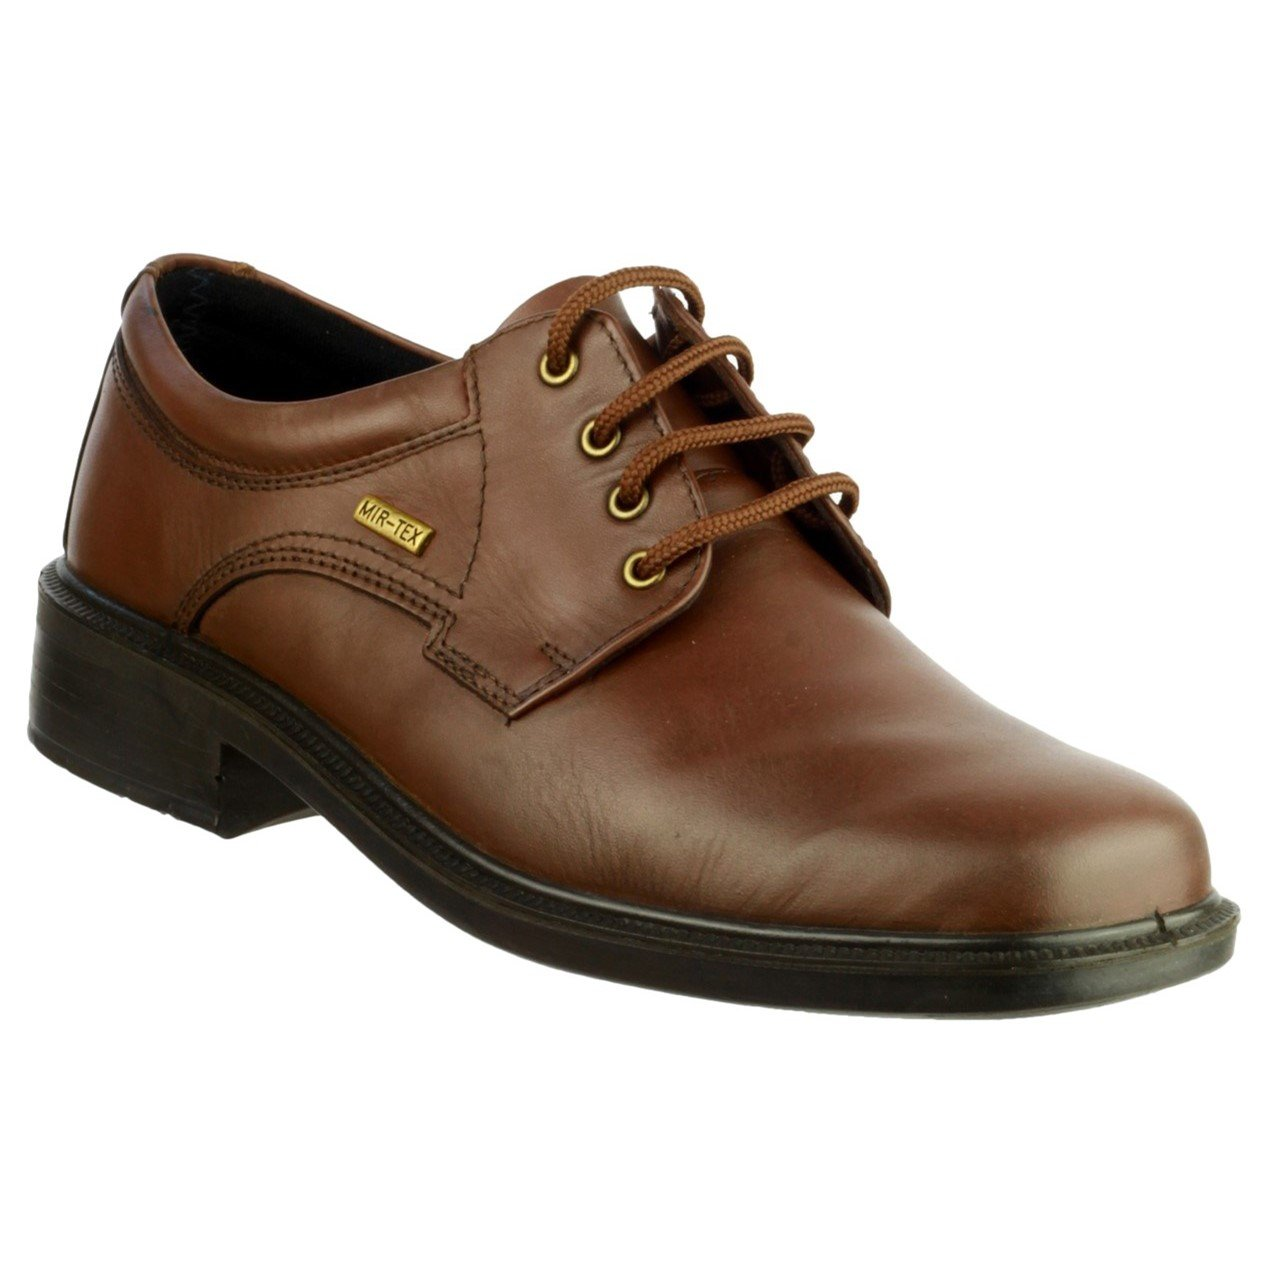 Cotswold Men's Sudeley Waterproof Shoe Various Colours 32970 - Brown 9